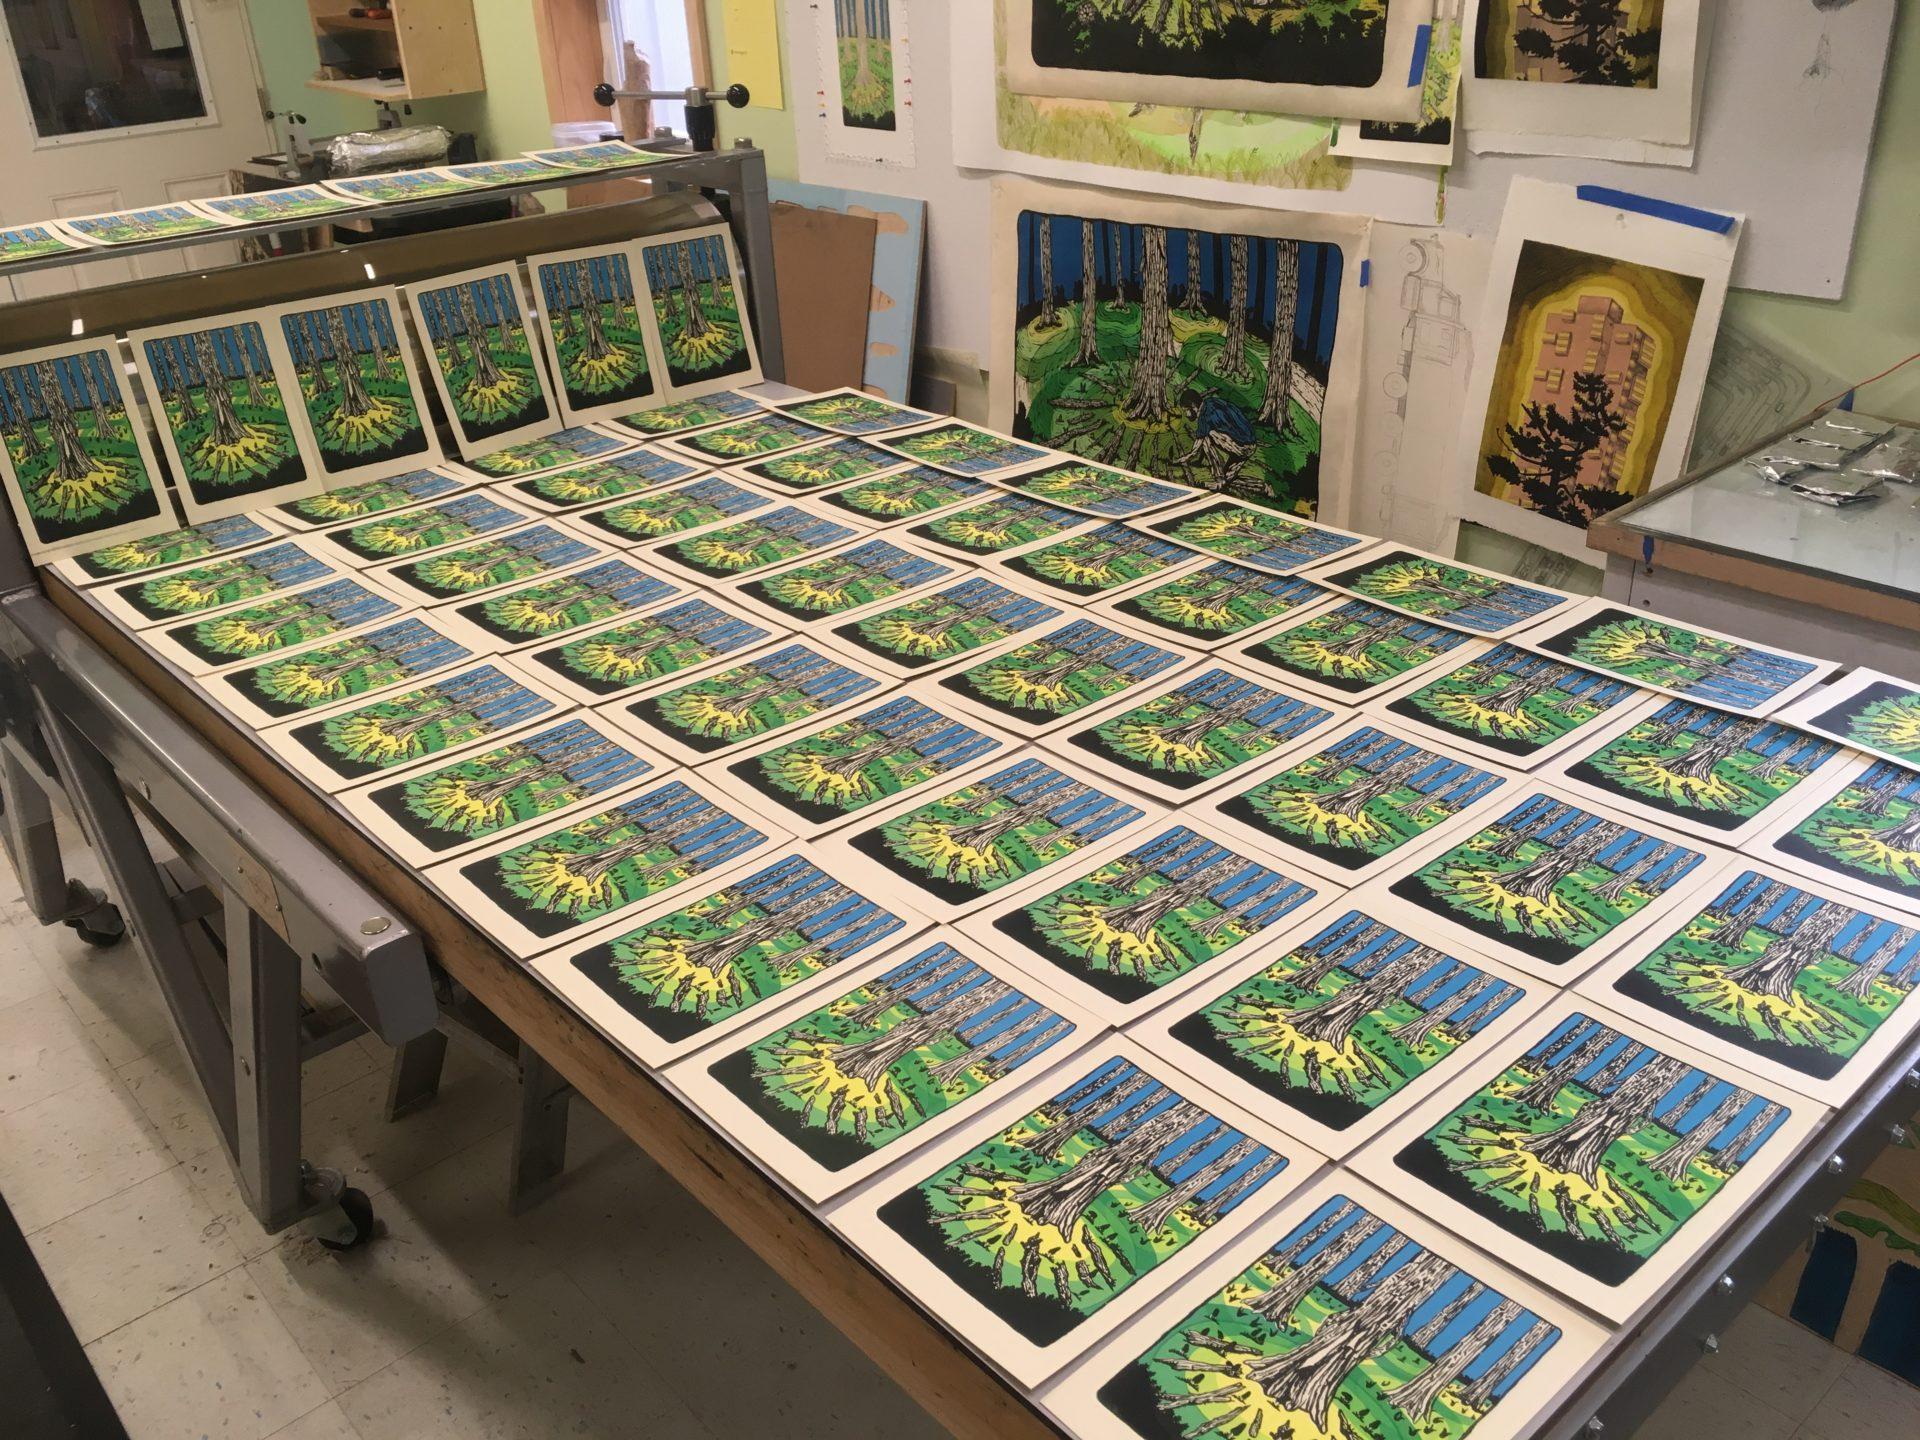 Prints of